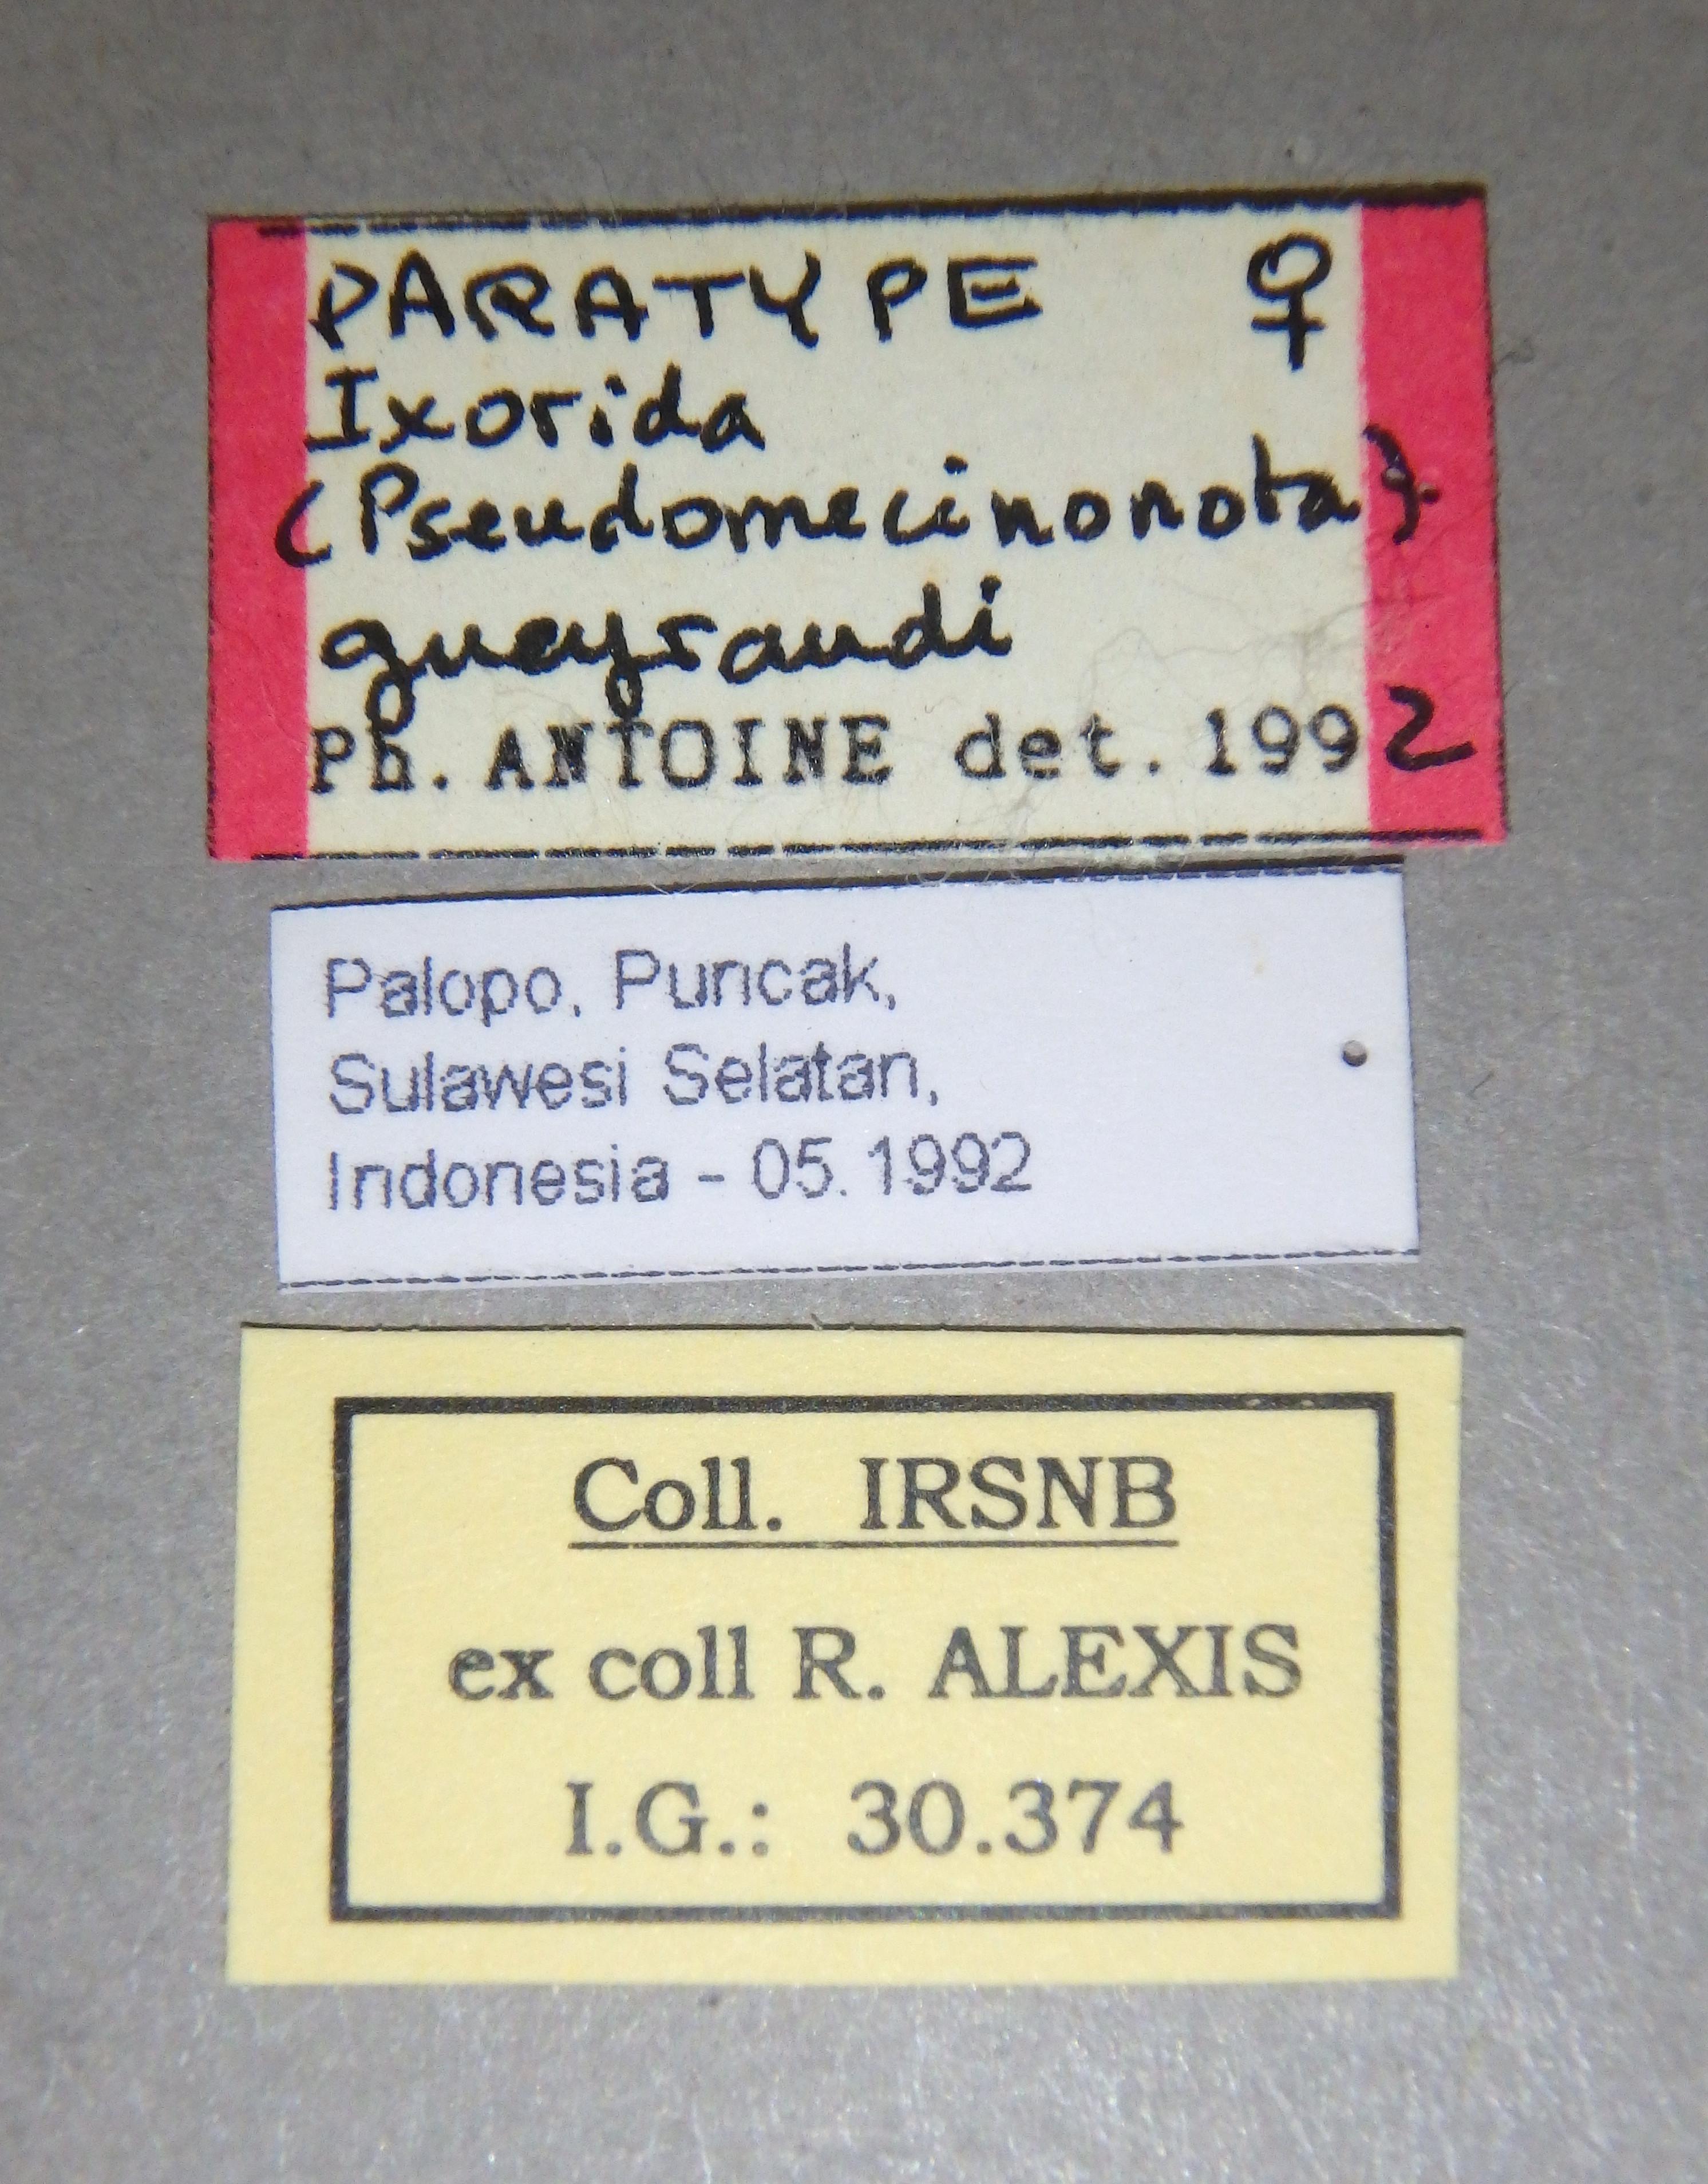 Ixorida (Pseudomecinonota) gueyraudi pt Lb.JPG